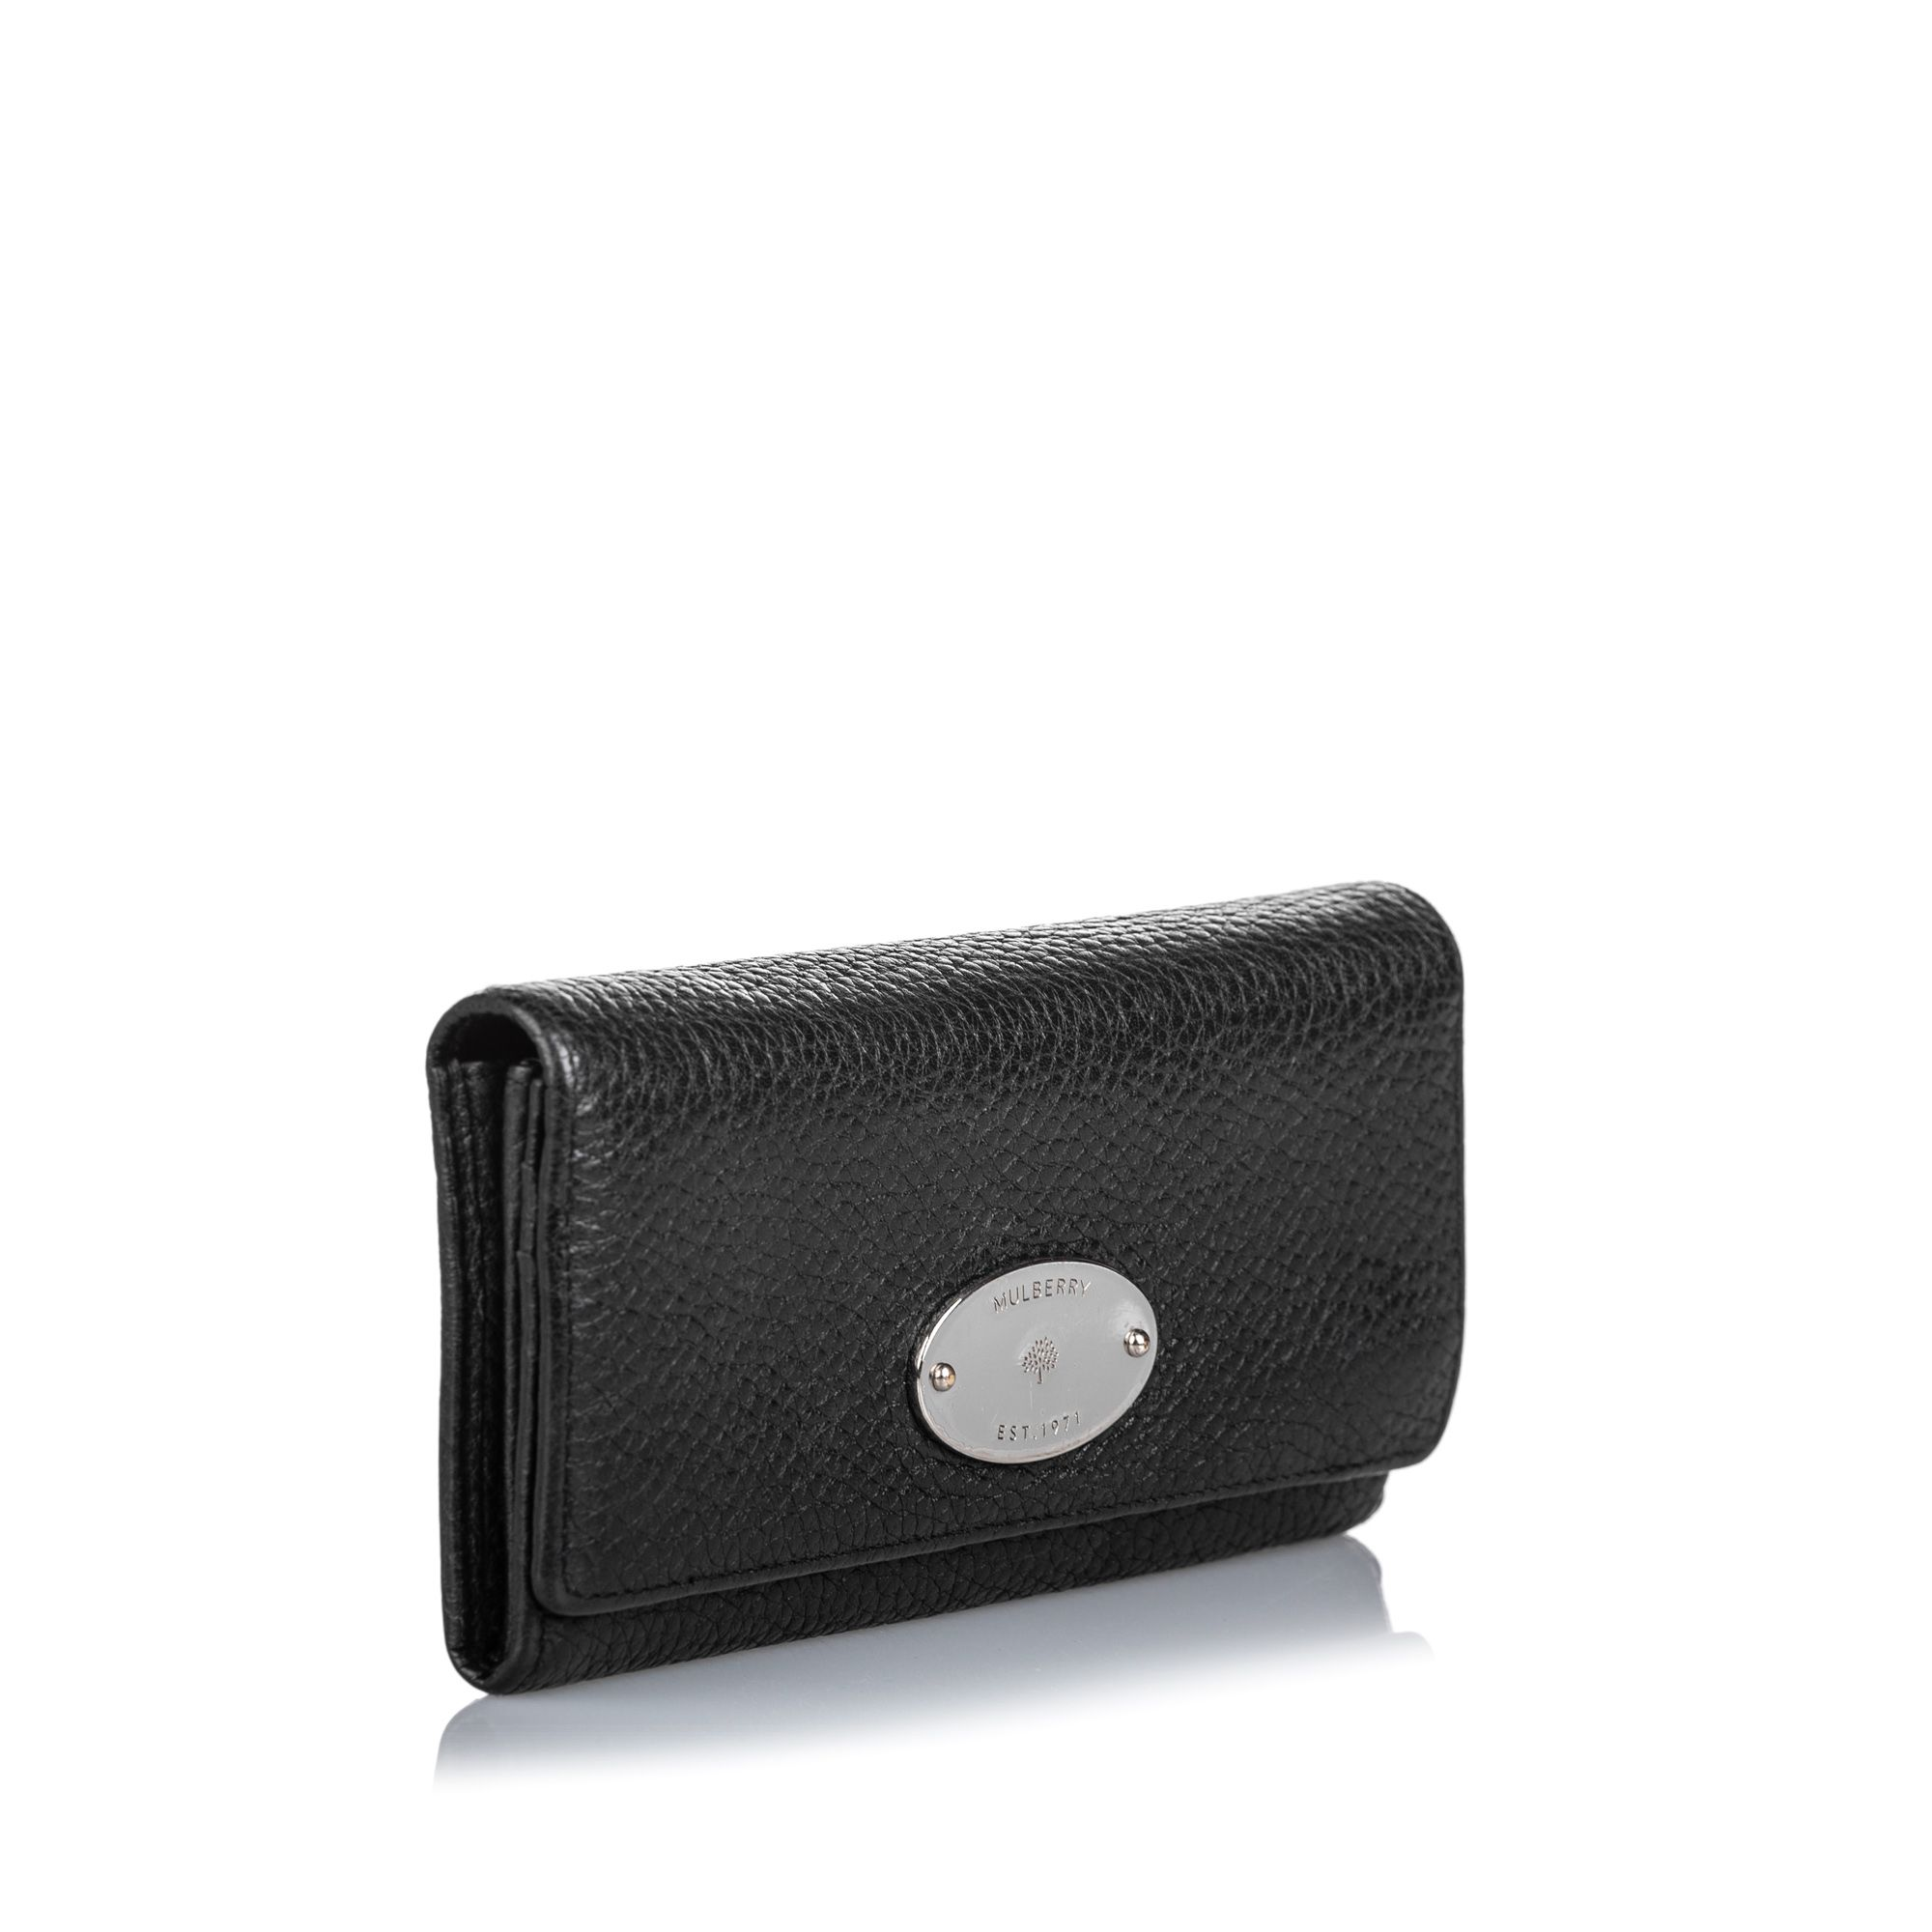 Vintage Mulberry Leather Long Wallet Black